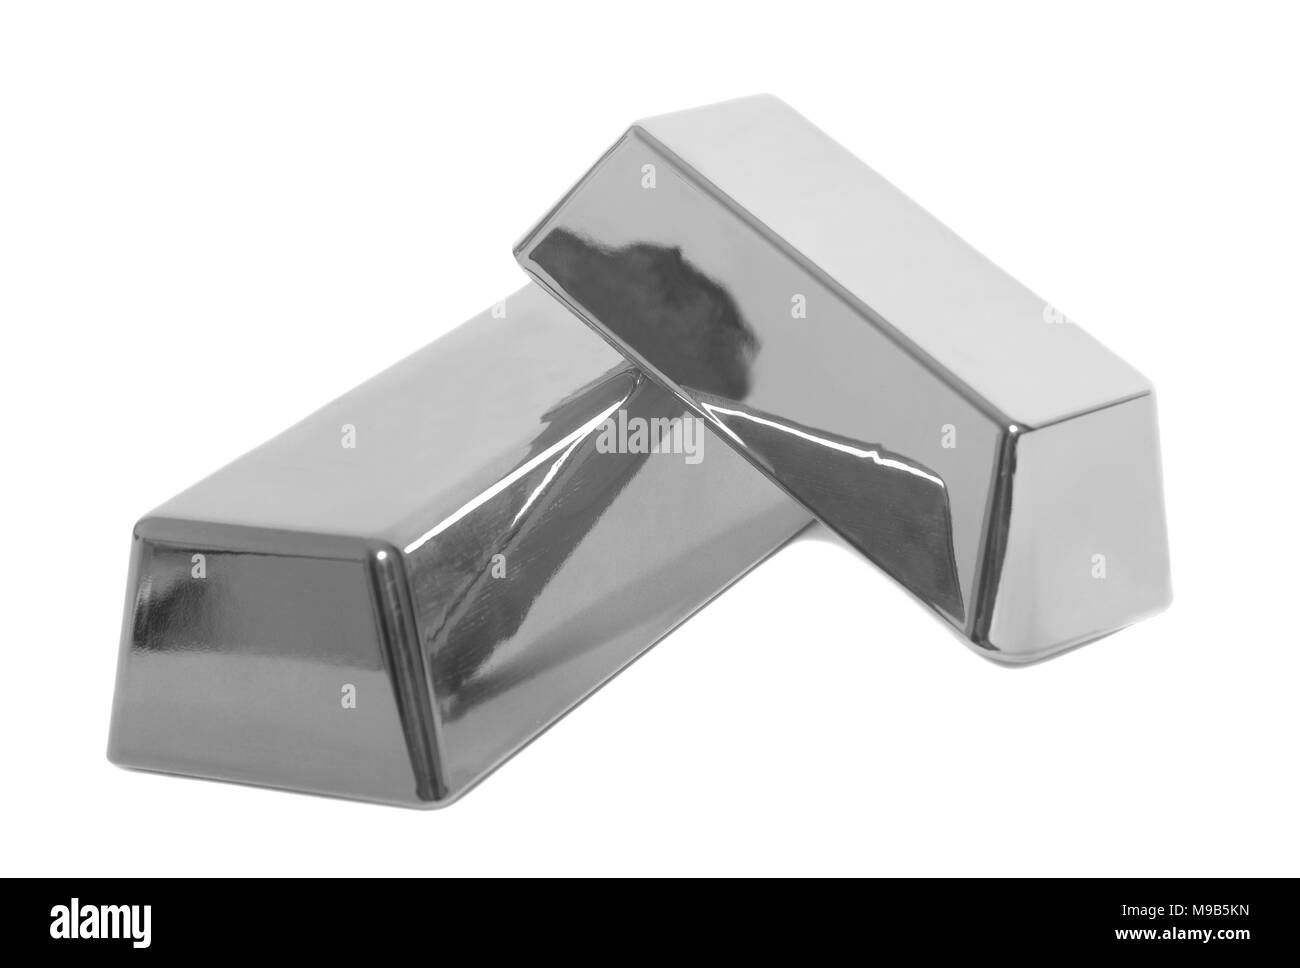 Silver bullion bars on white background - Stock Image